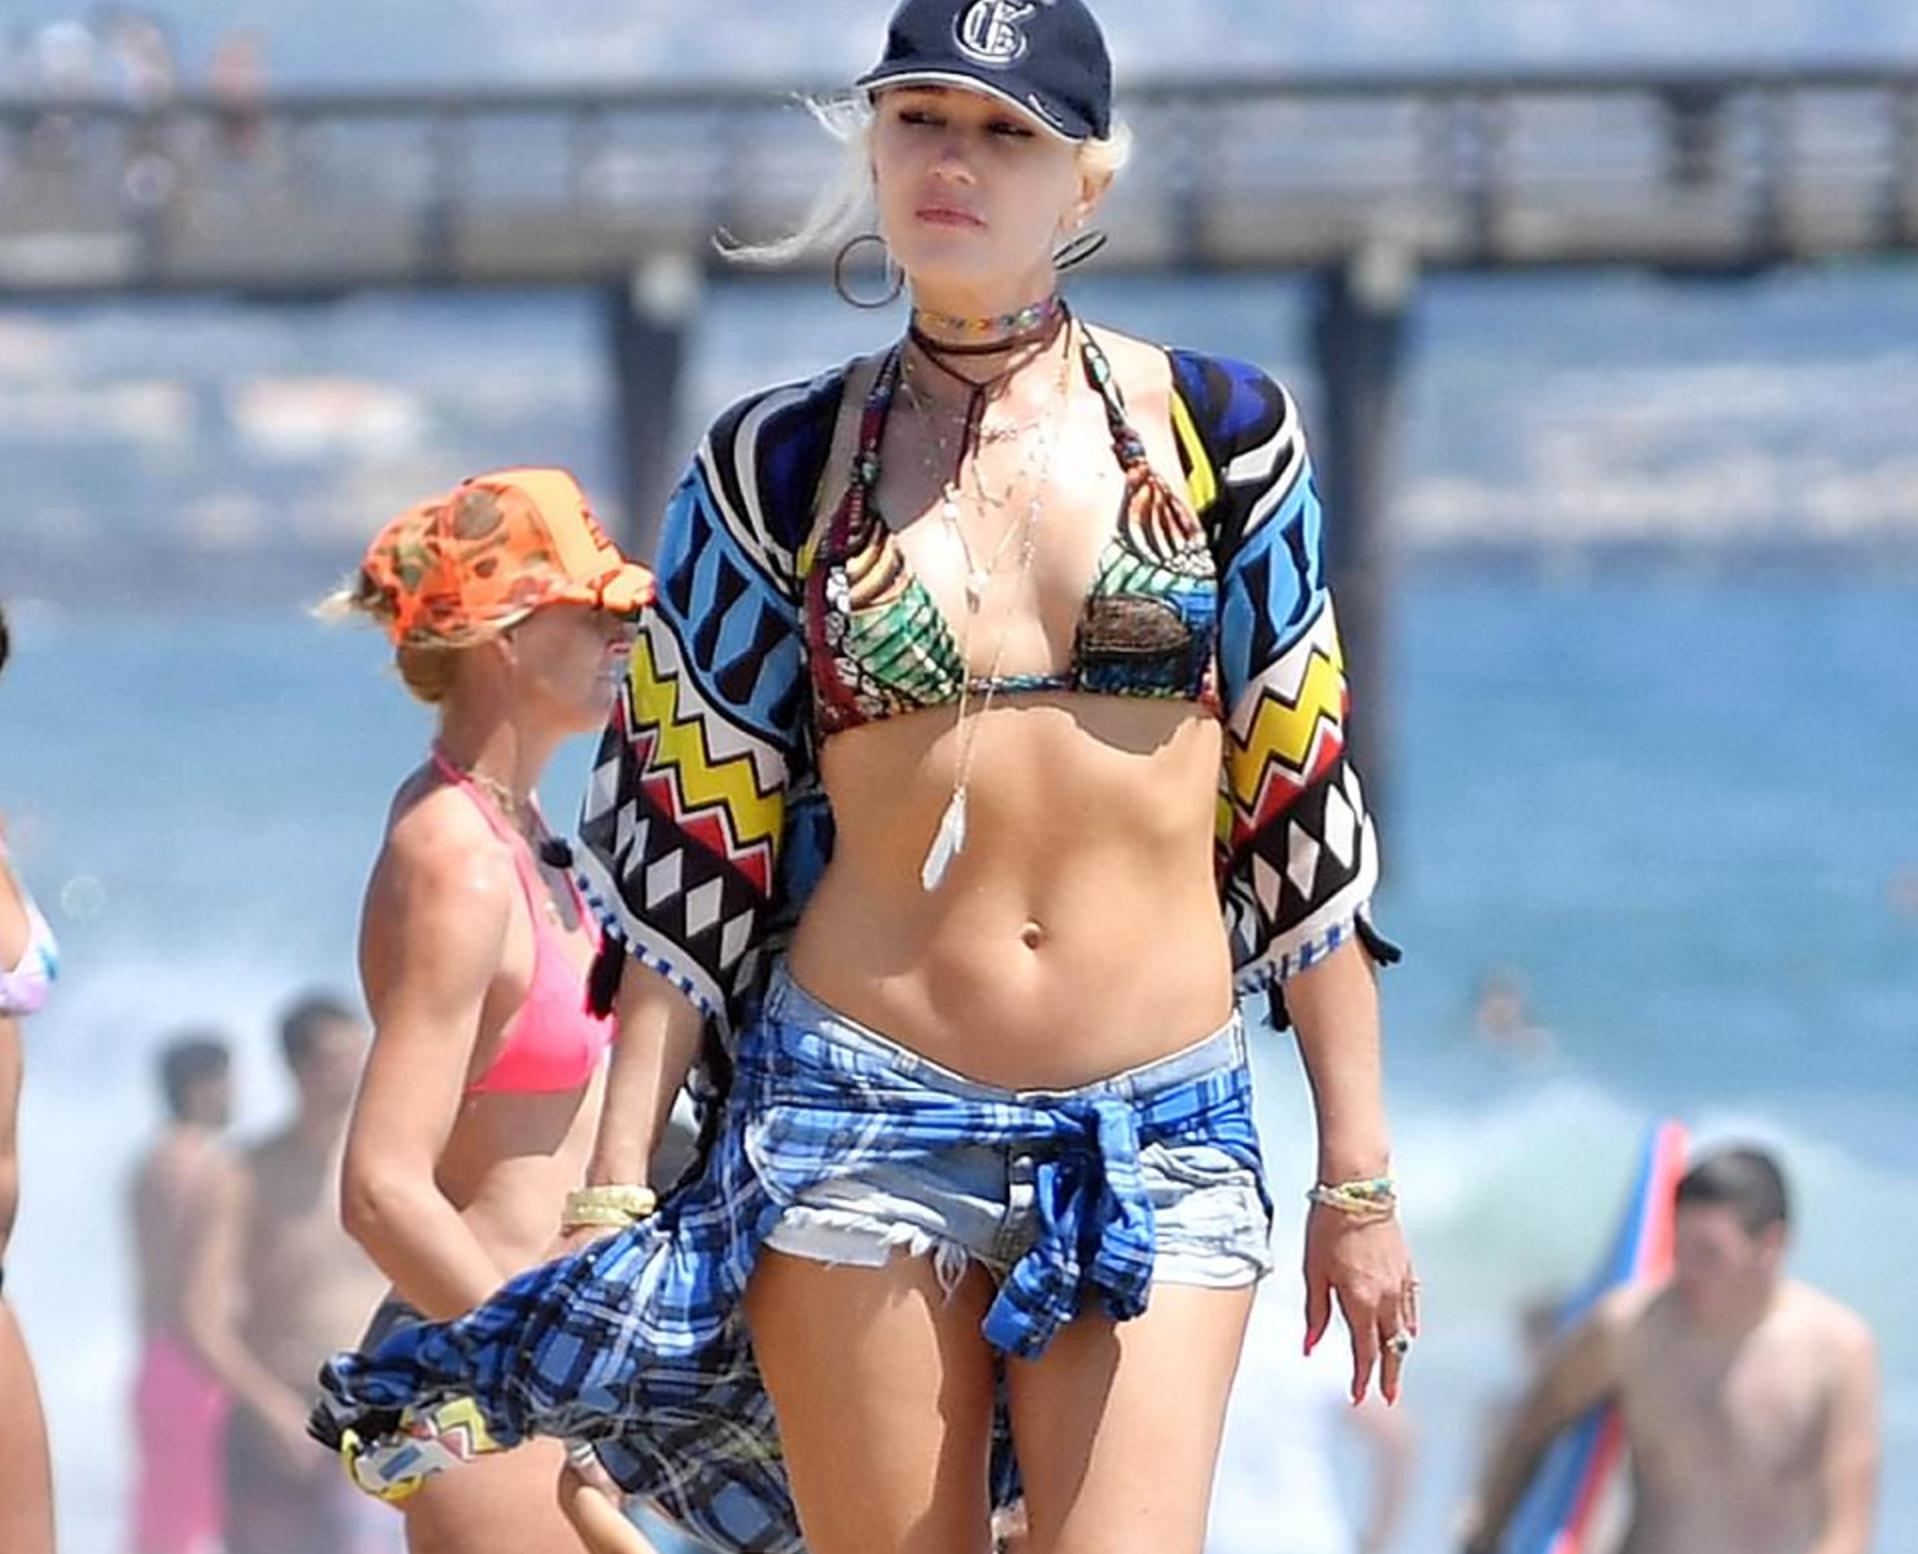 Gwen Stefani Hits the Beach in Vibrant Bikini and Teeny Daisy Dukes